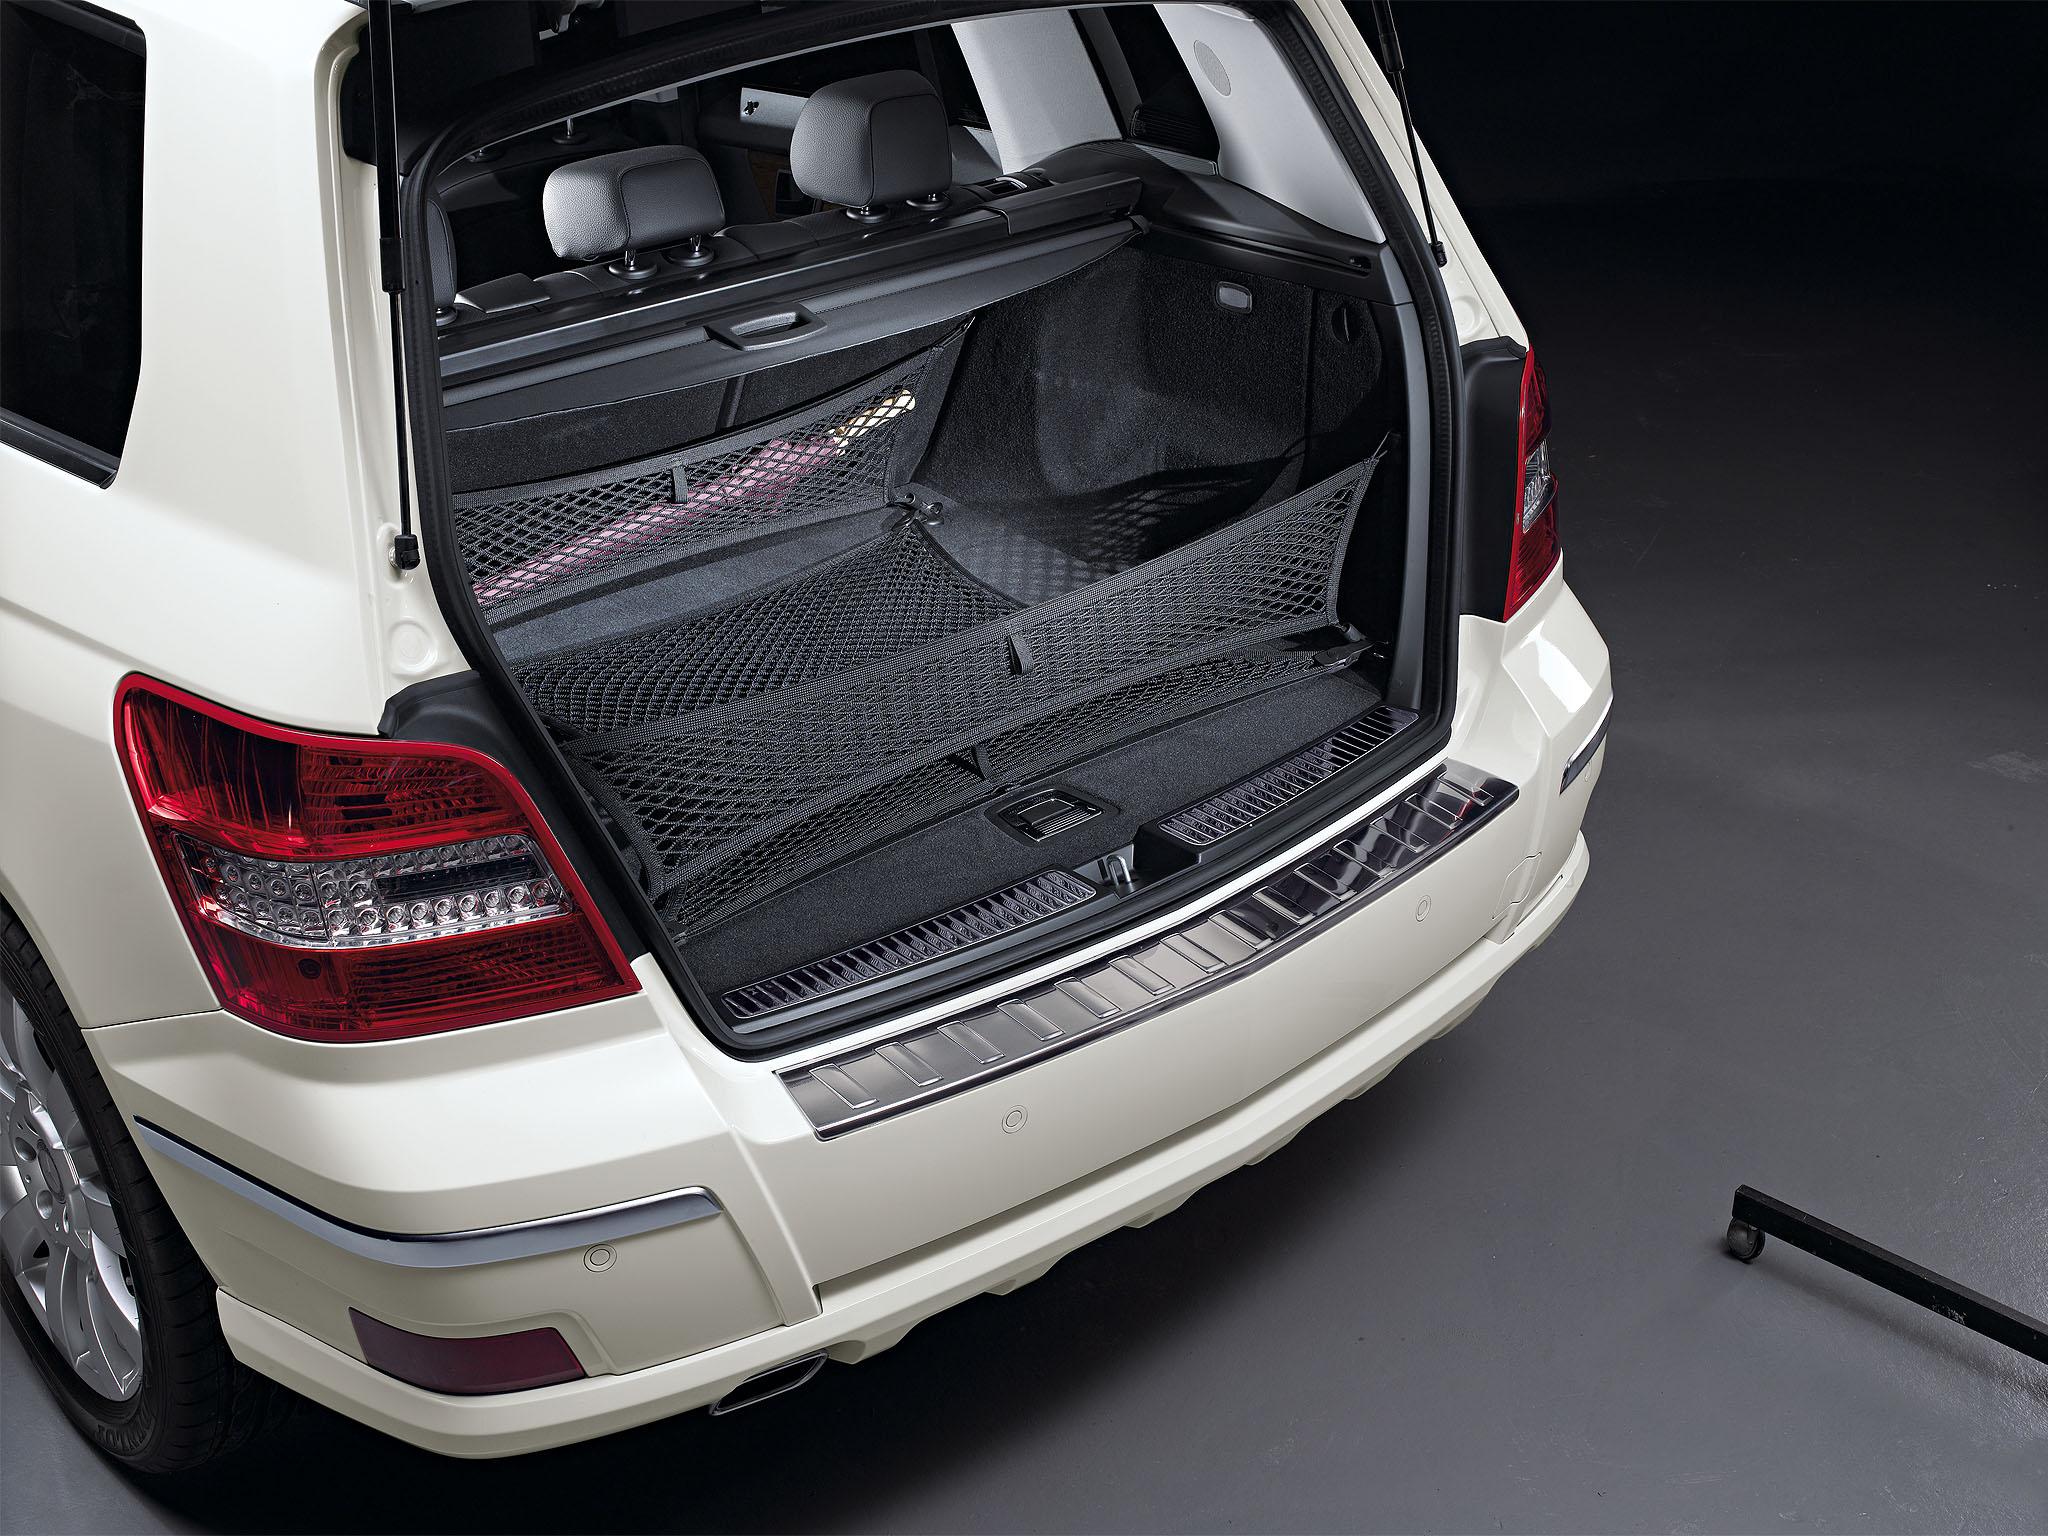 bagagenet achterbank suv glk auto accessoires mercedes benz official online shop. Black Bedroom Furniture Sets. Home Design Ideas